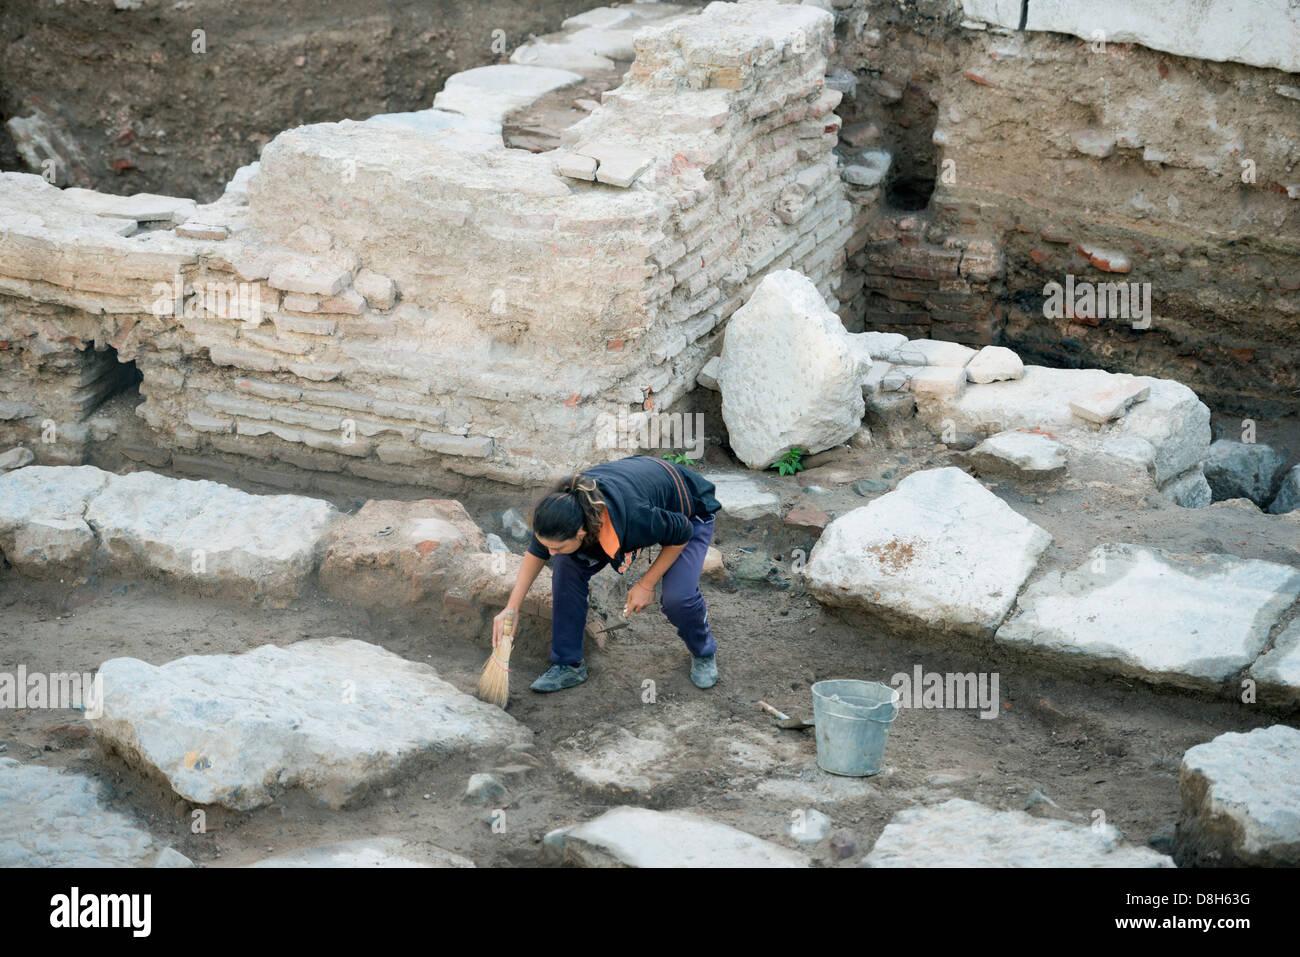 Europe, Bulgaria, Sofia, archaeological dig - Stock Image